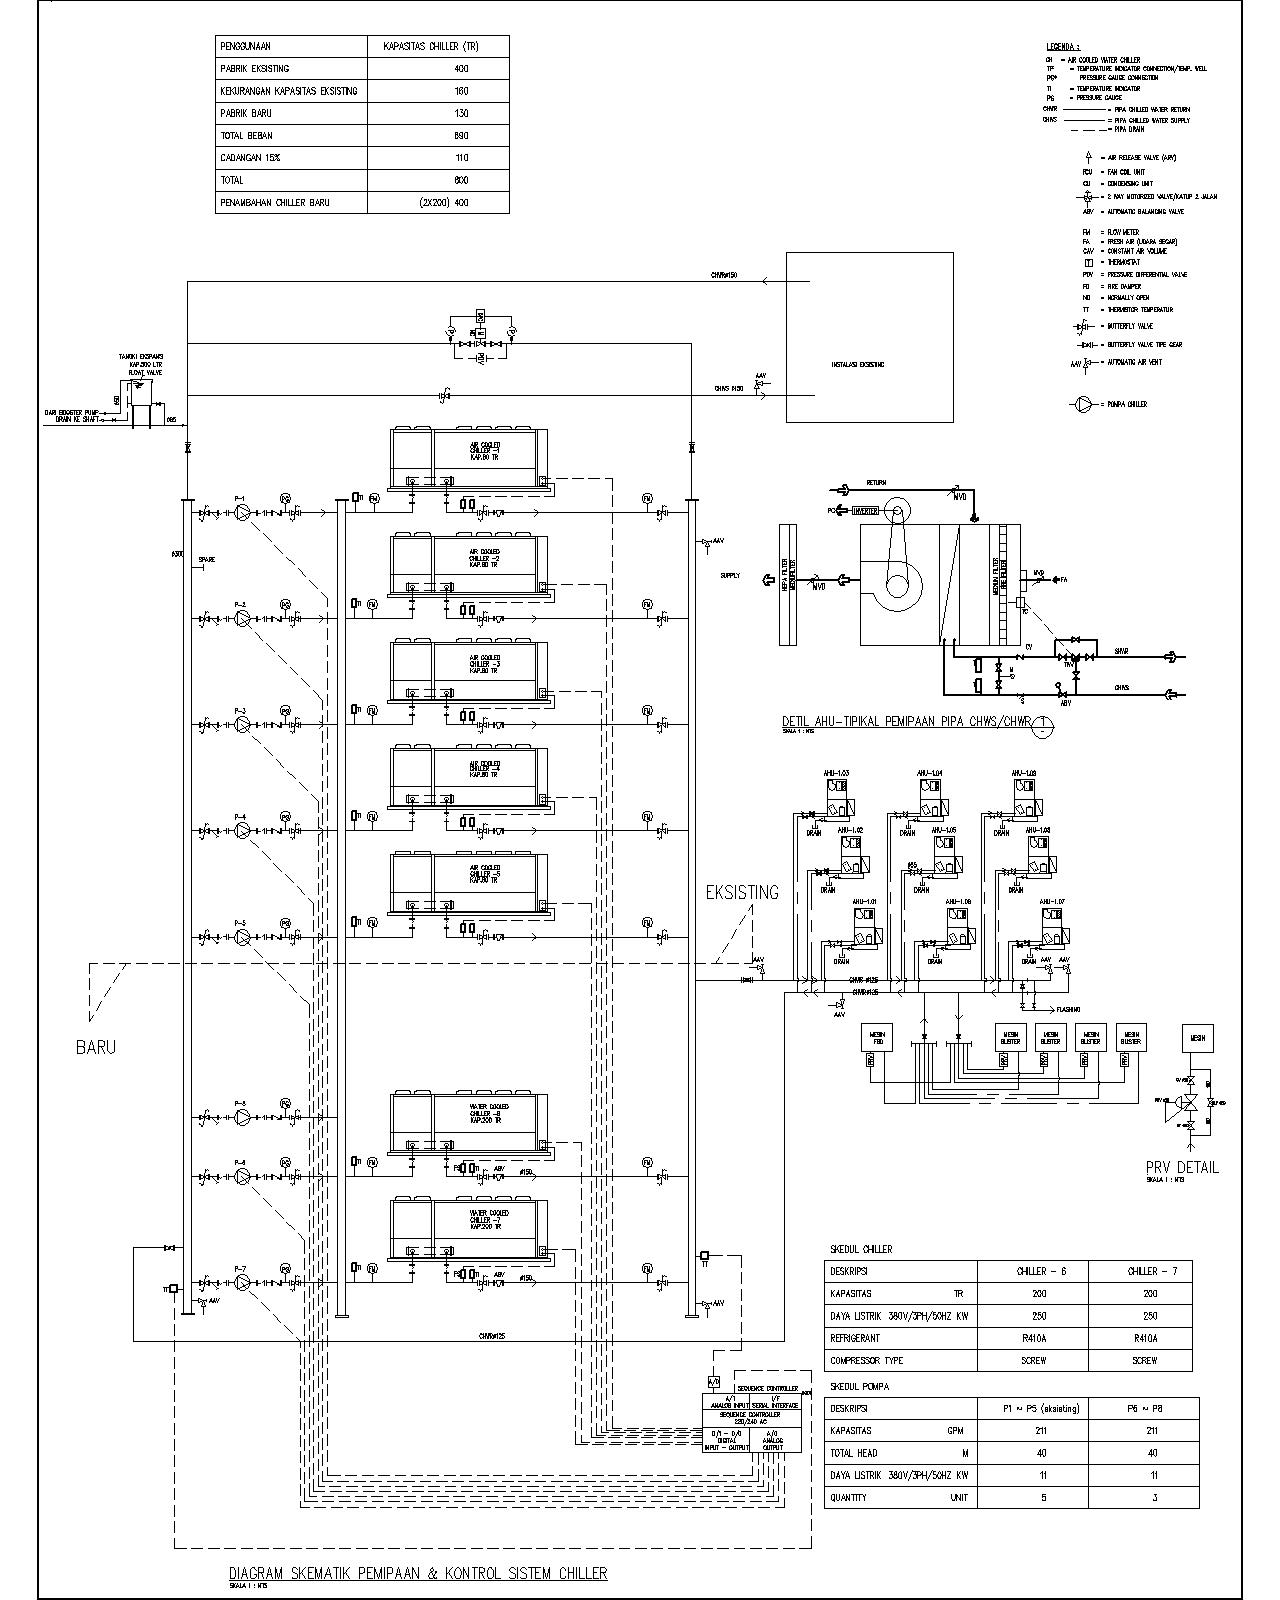 Building utilities water cooled chiller schematic diagram rh buildingutilities blogspot absorption chiller schematic diagram water